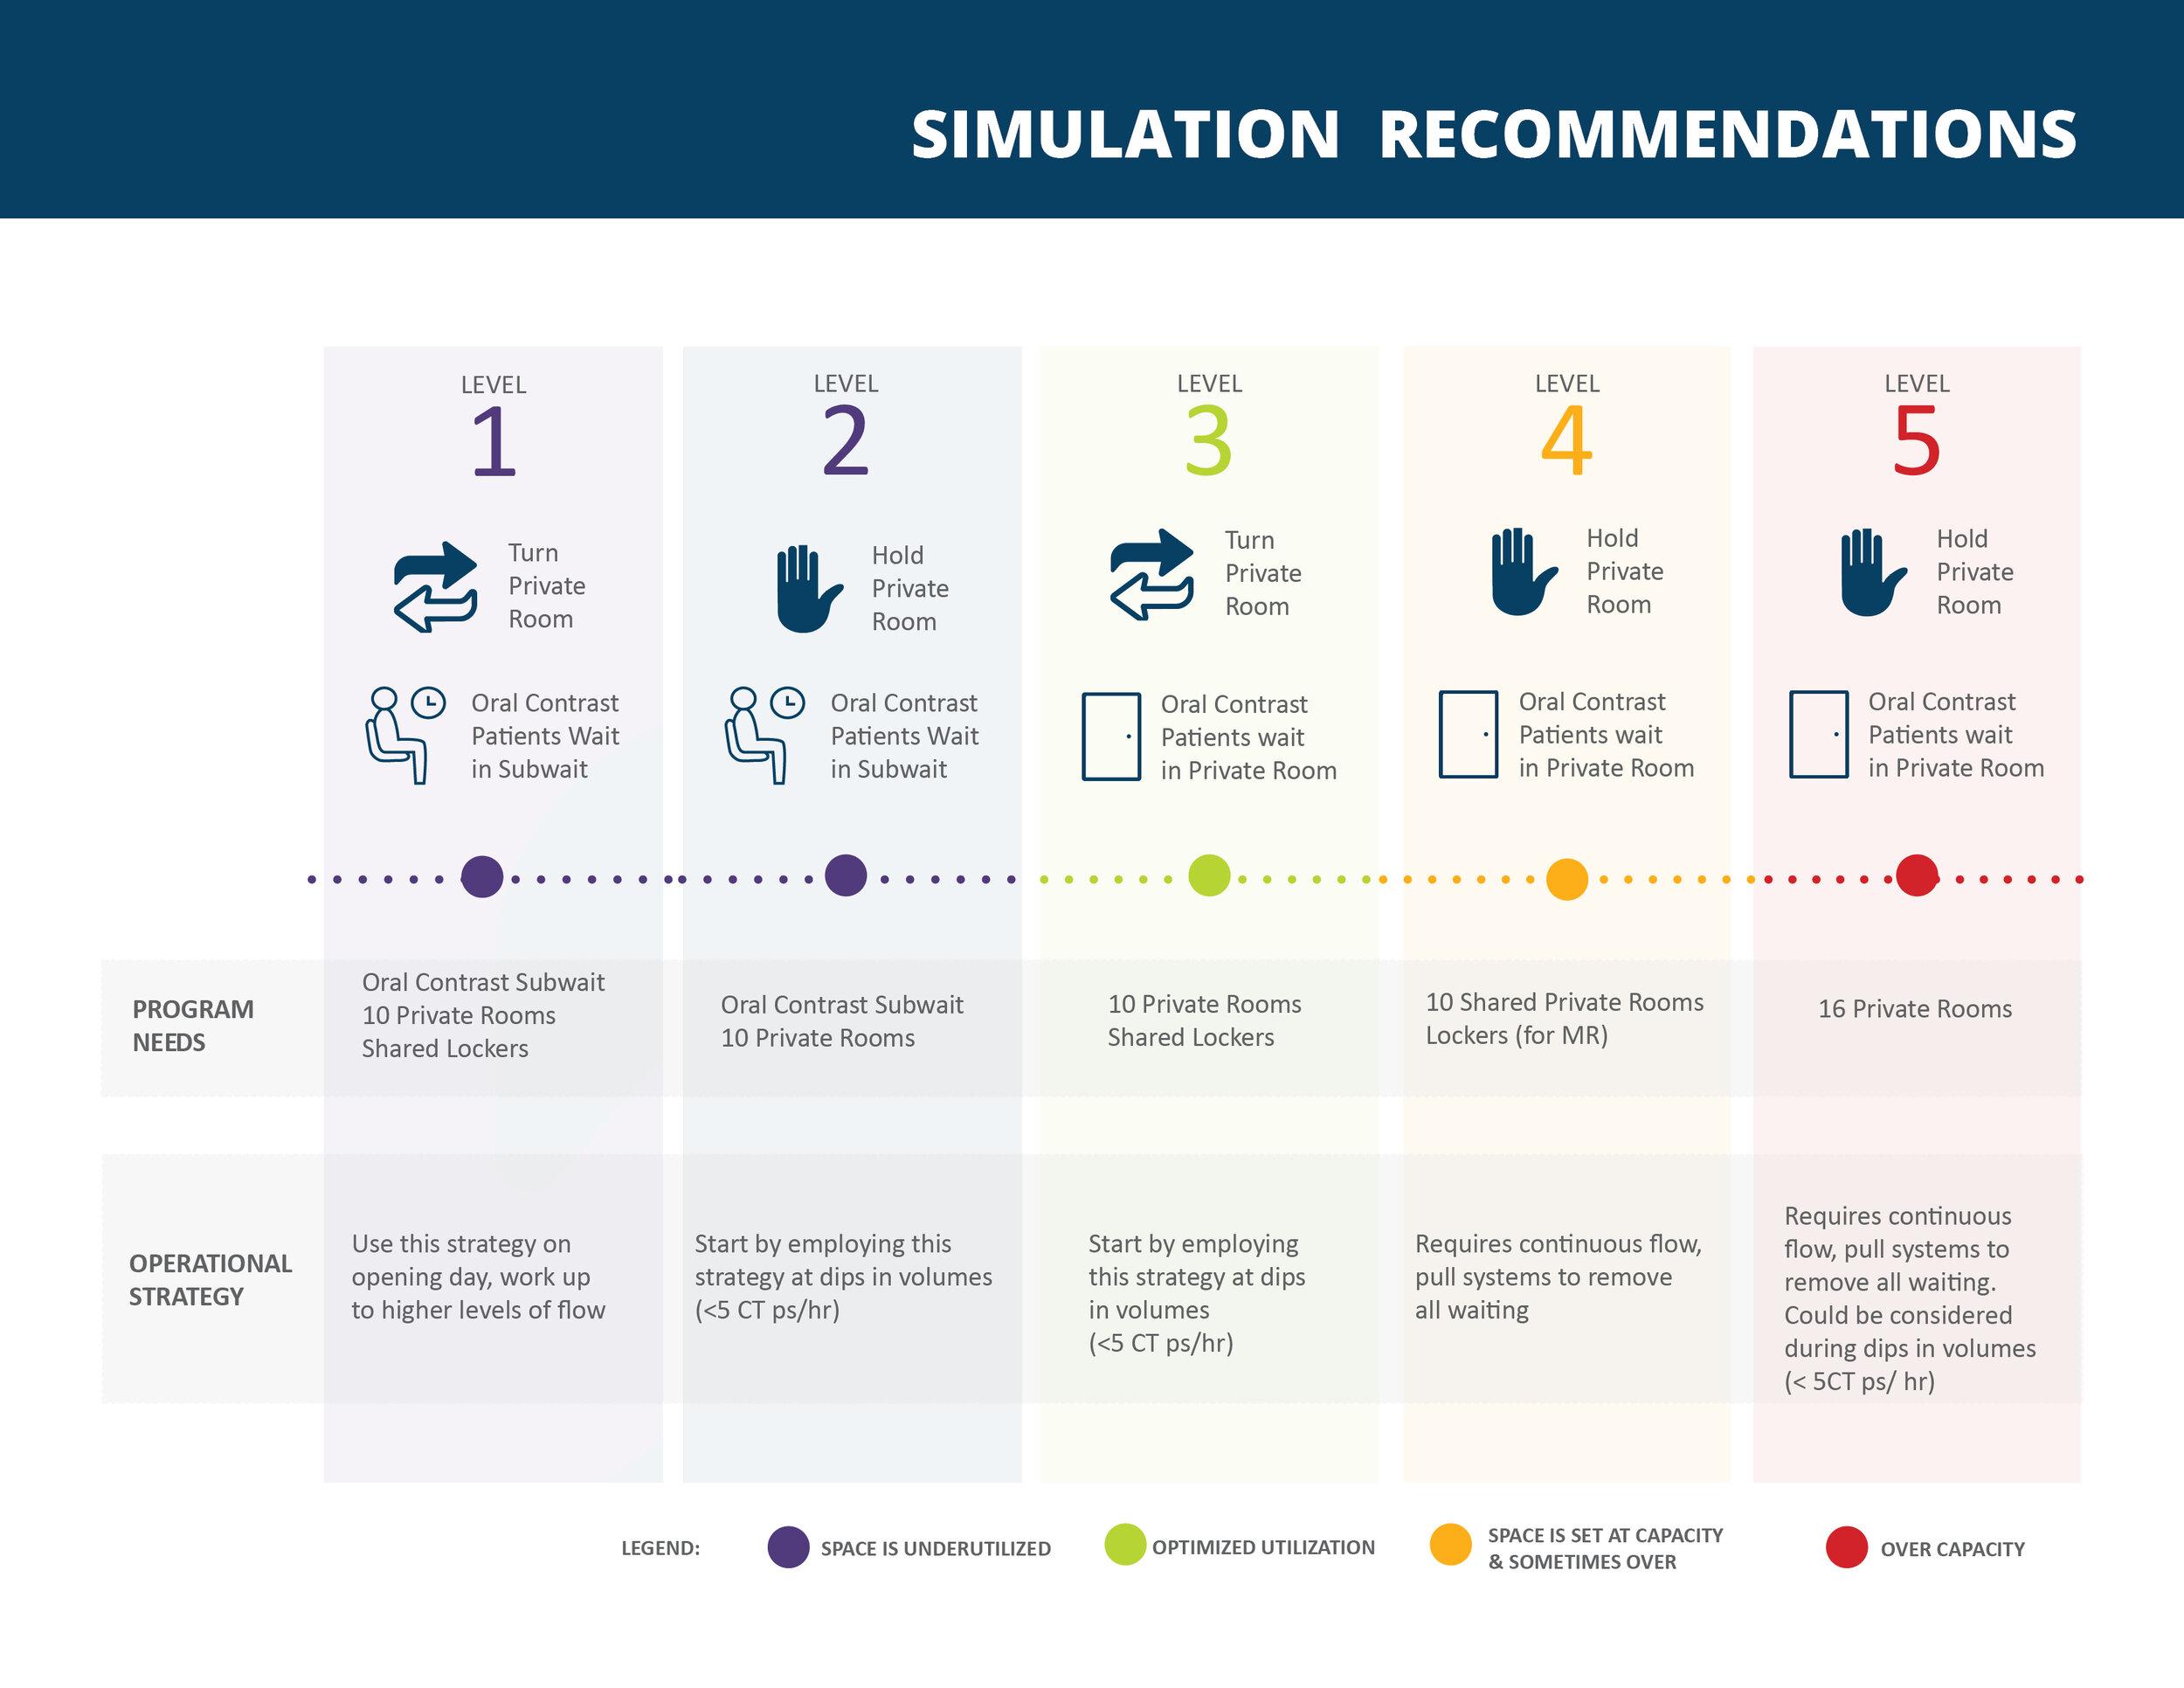 simulationrecommendations.jpg